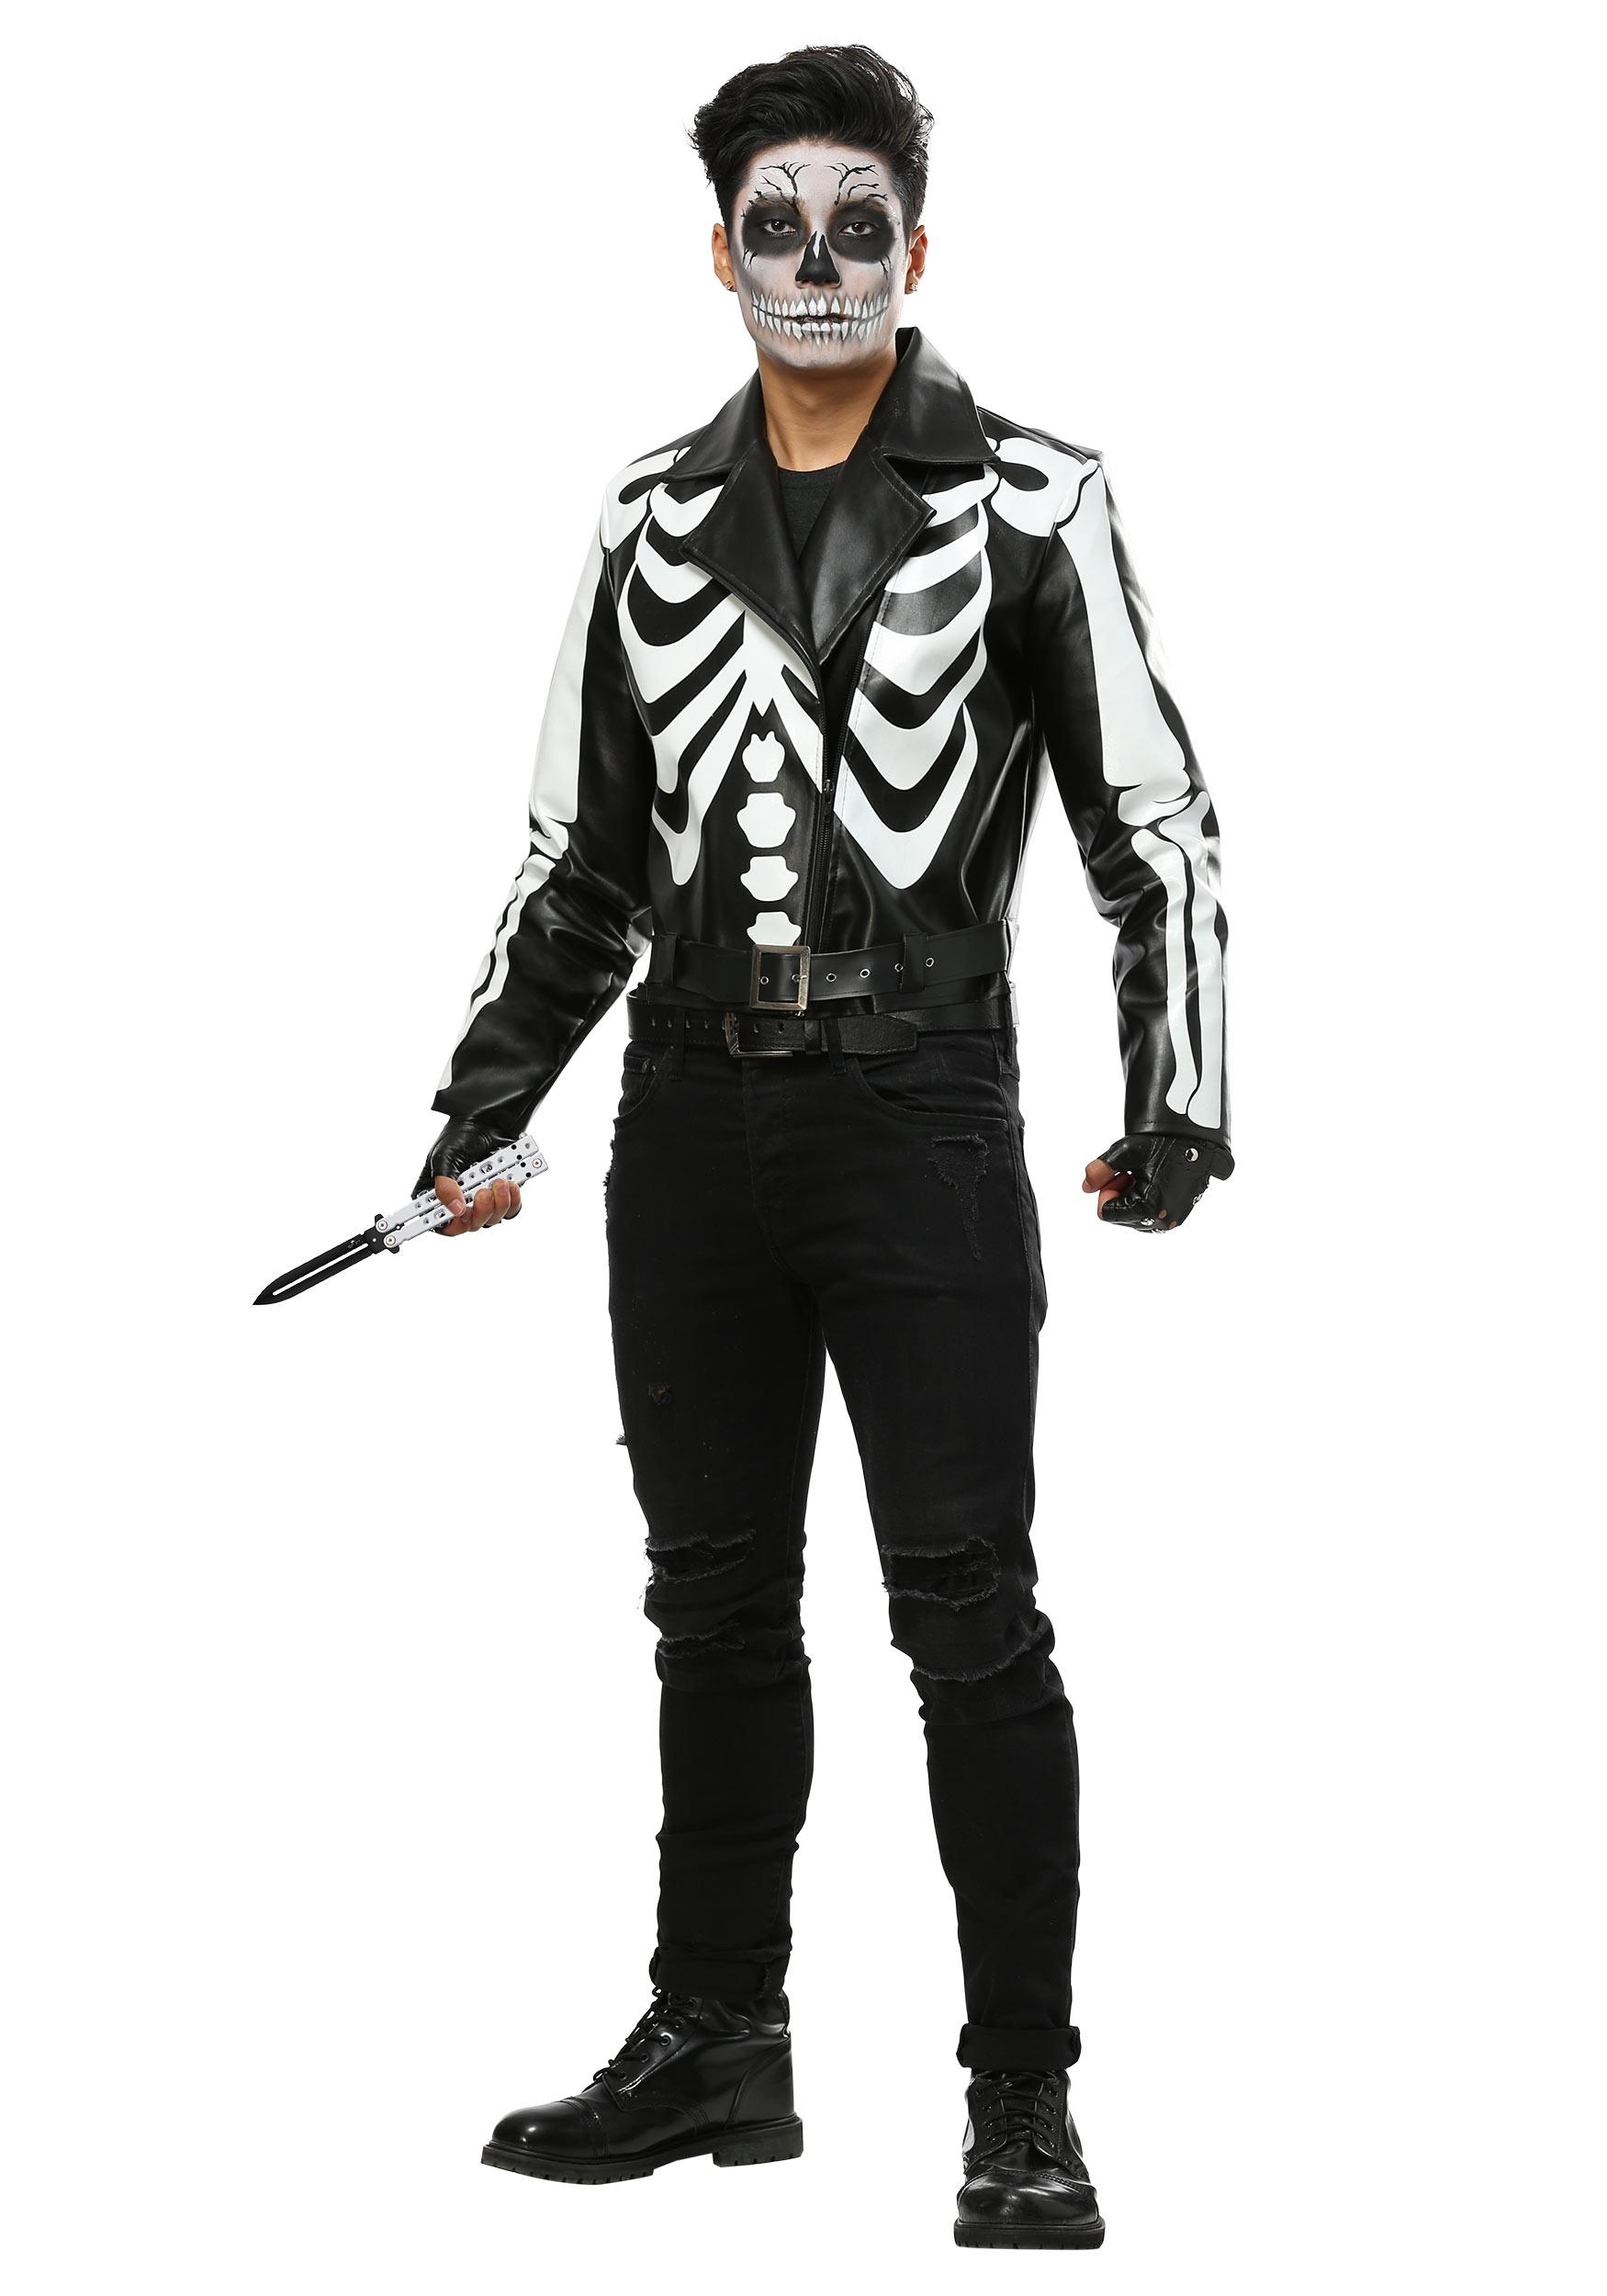 Skull Hooded Mask Bones Skeleton Disappearing Man Halloween Costume Accessory